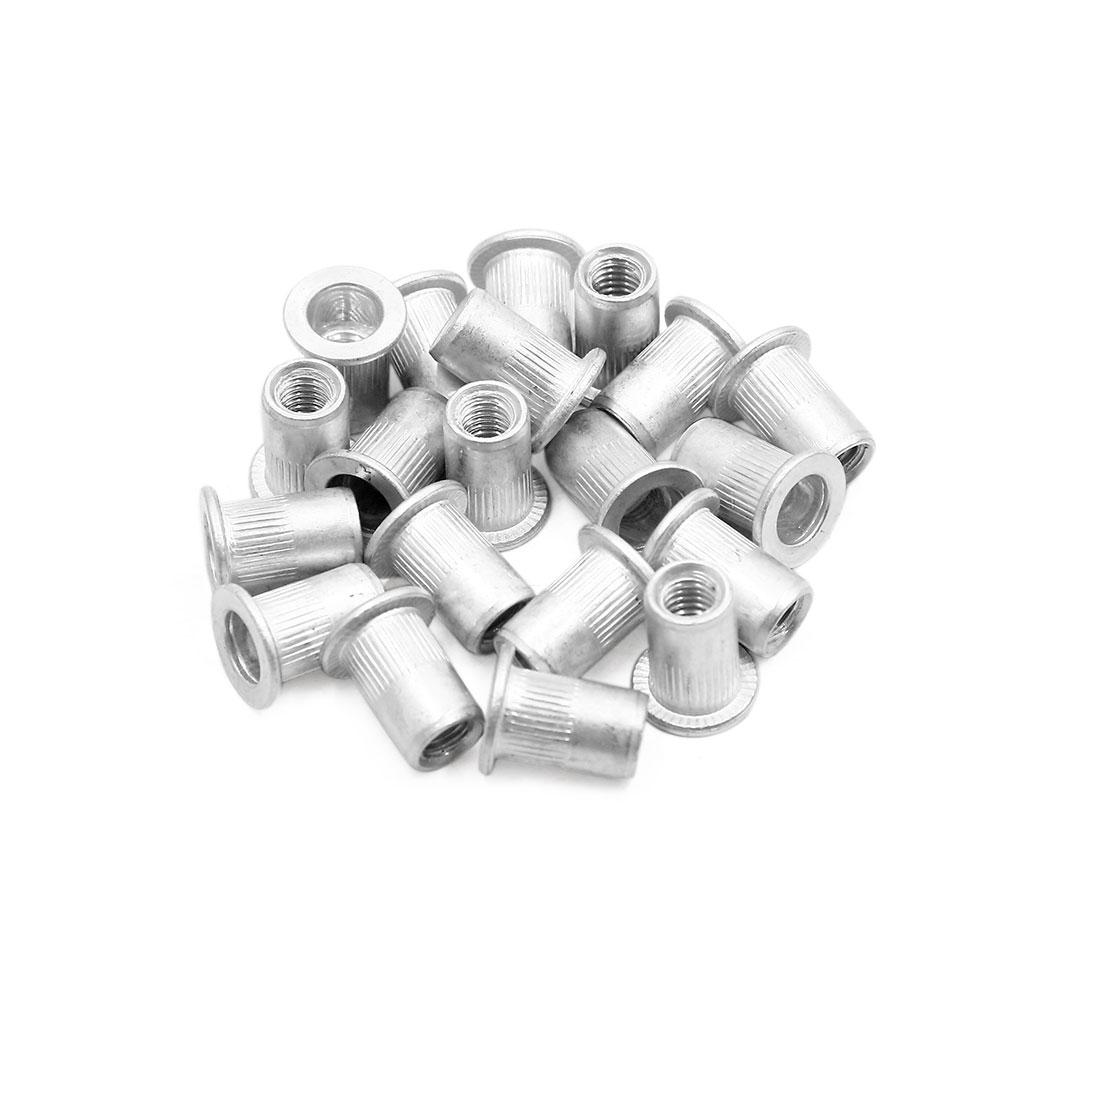 20pcs M6 Silver Tone Flat Head Rivet Nut Insert for Car Vehicle